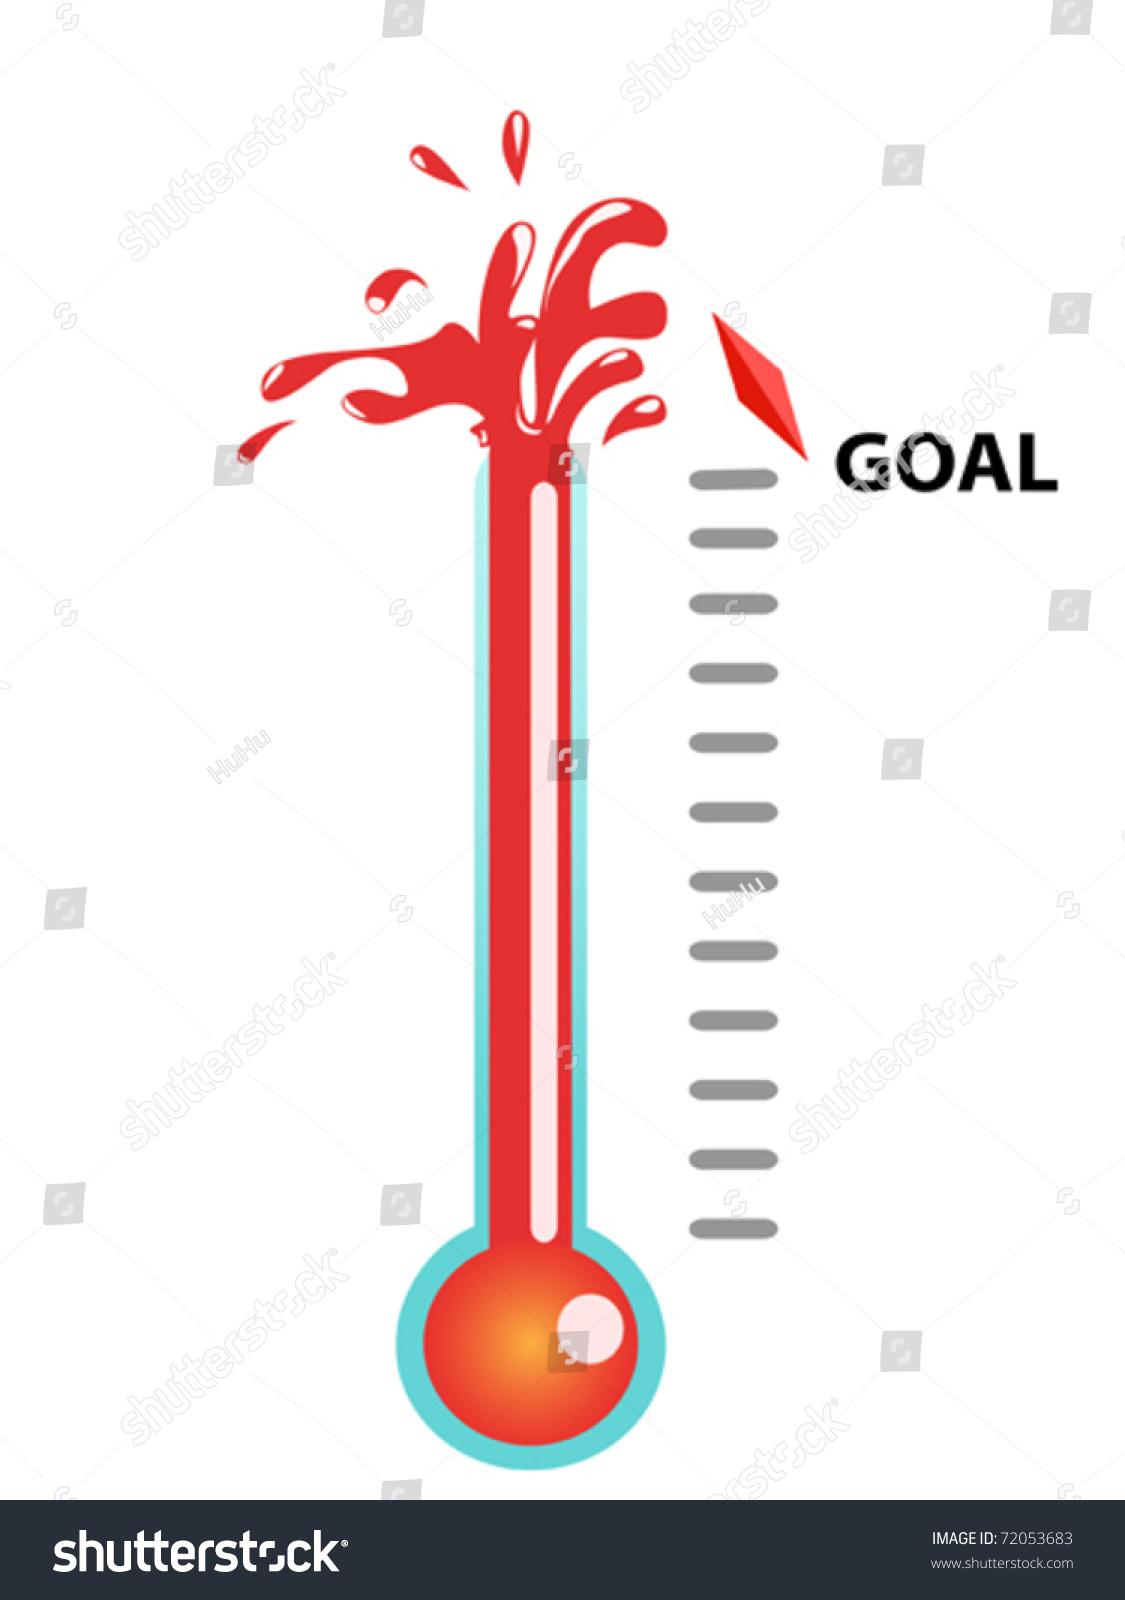 Free Clip Art of Thermometers  TeacherFilescom